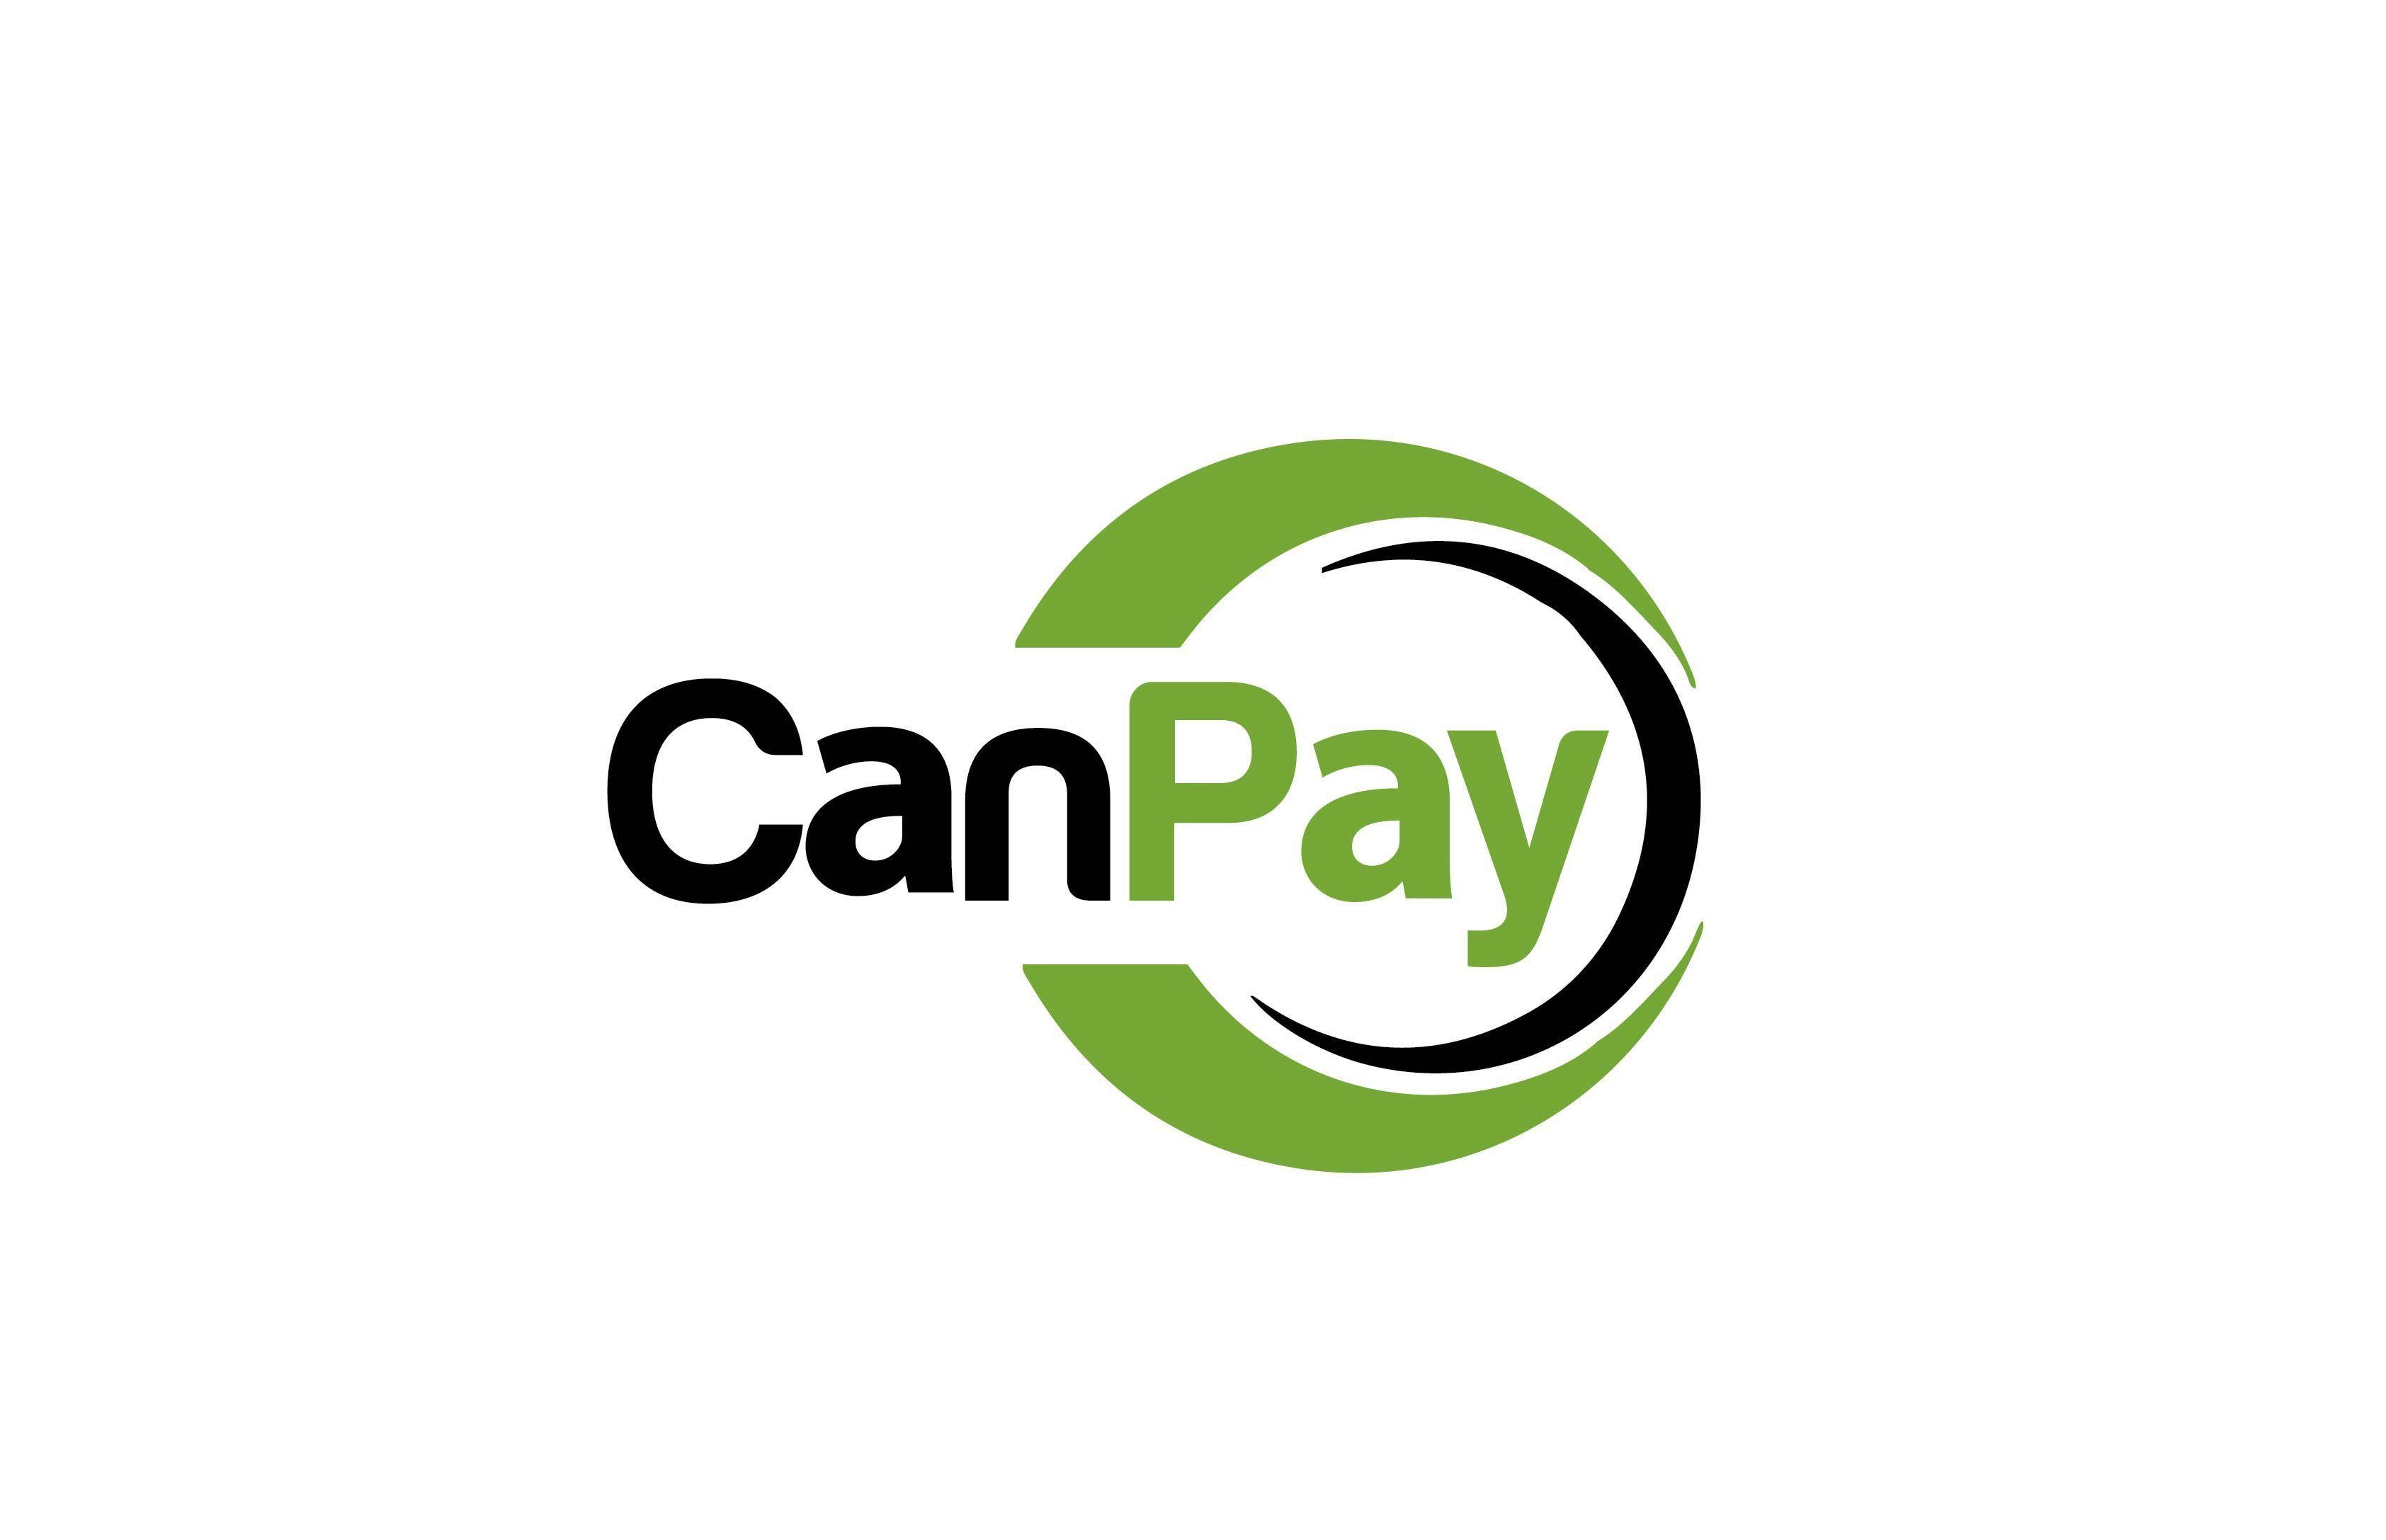 CanPay Debit Payment E-transfer